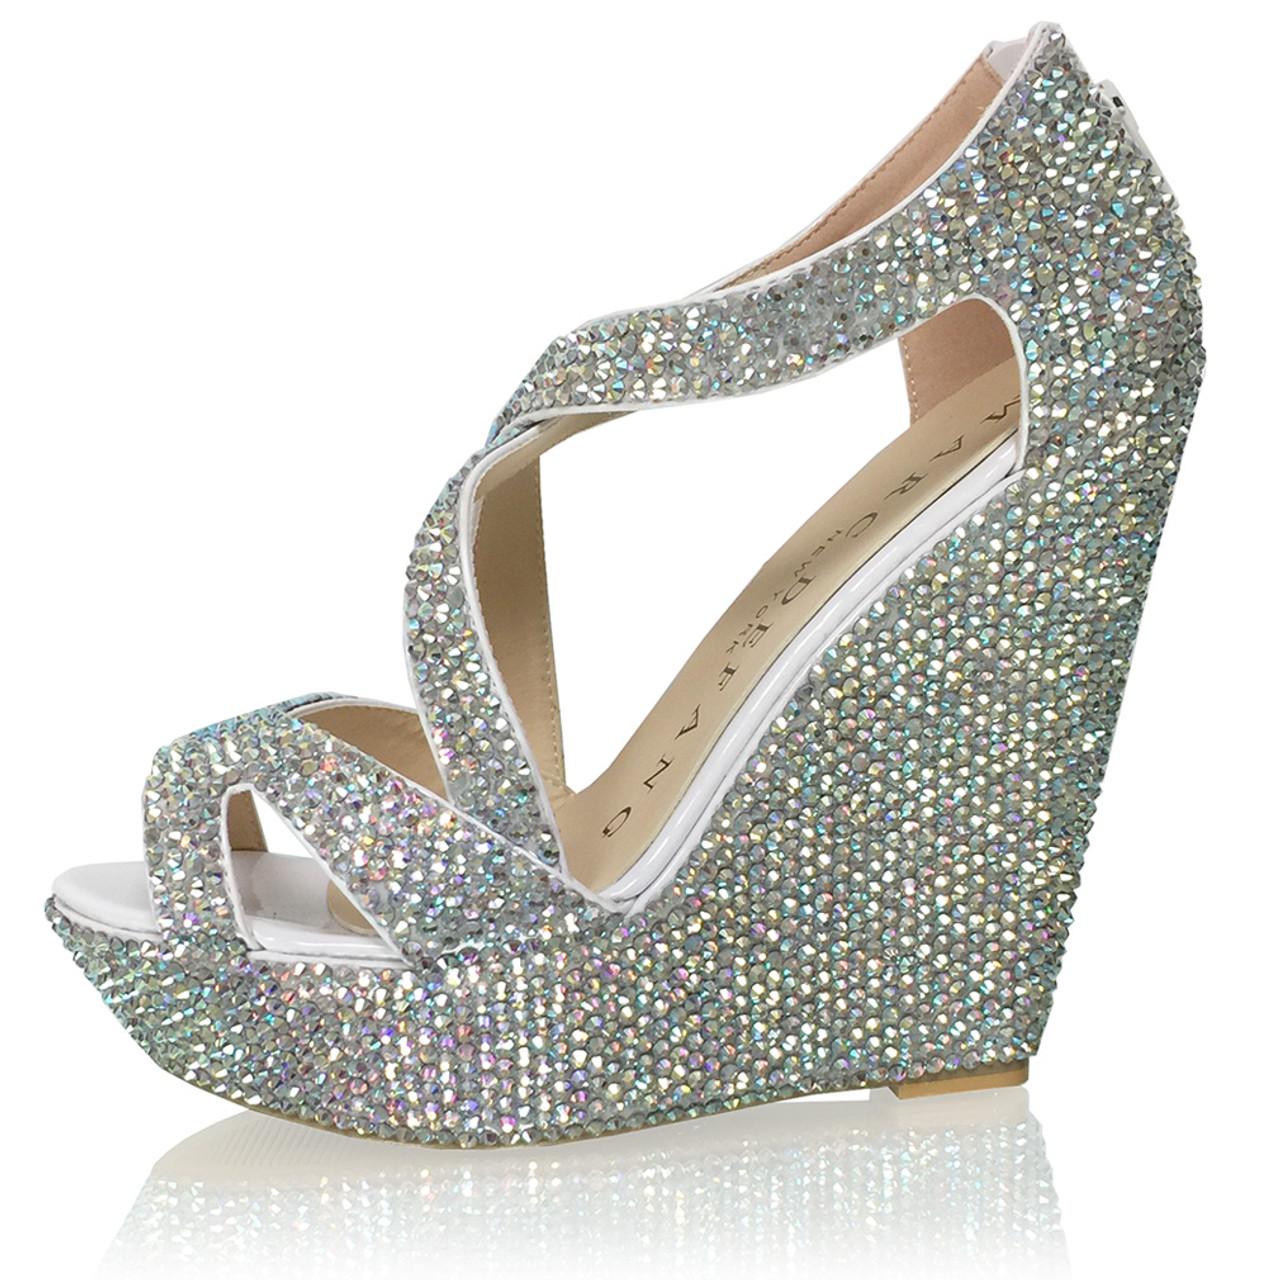 "5.5"" Heels Luxury Crystal Bridal Strappy Platform Wedges"